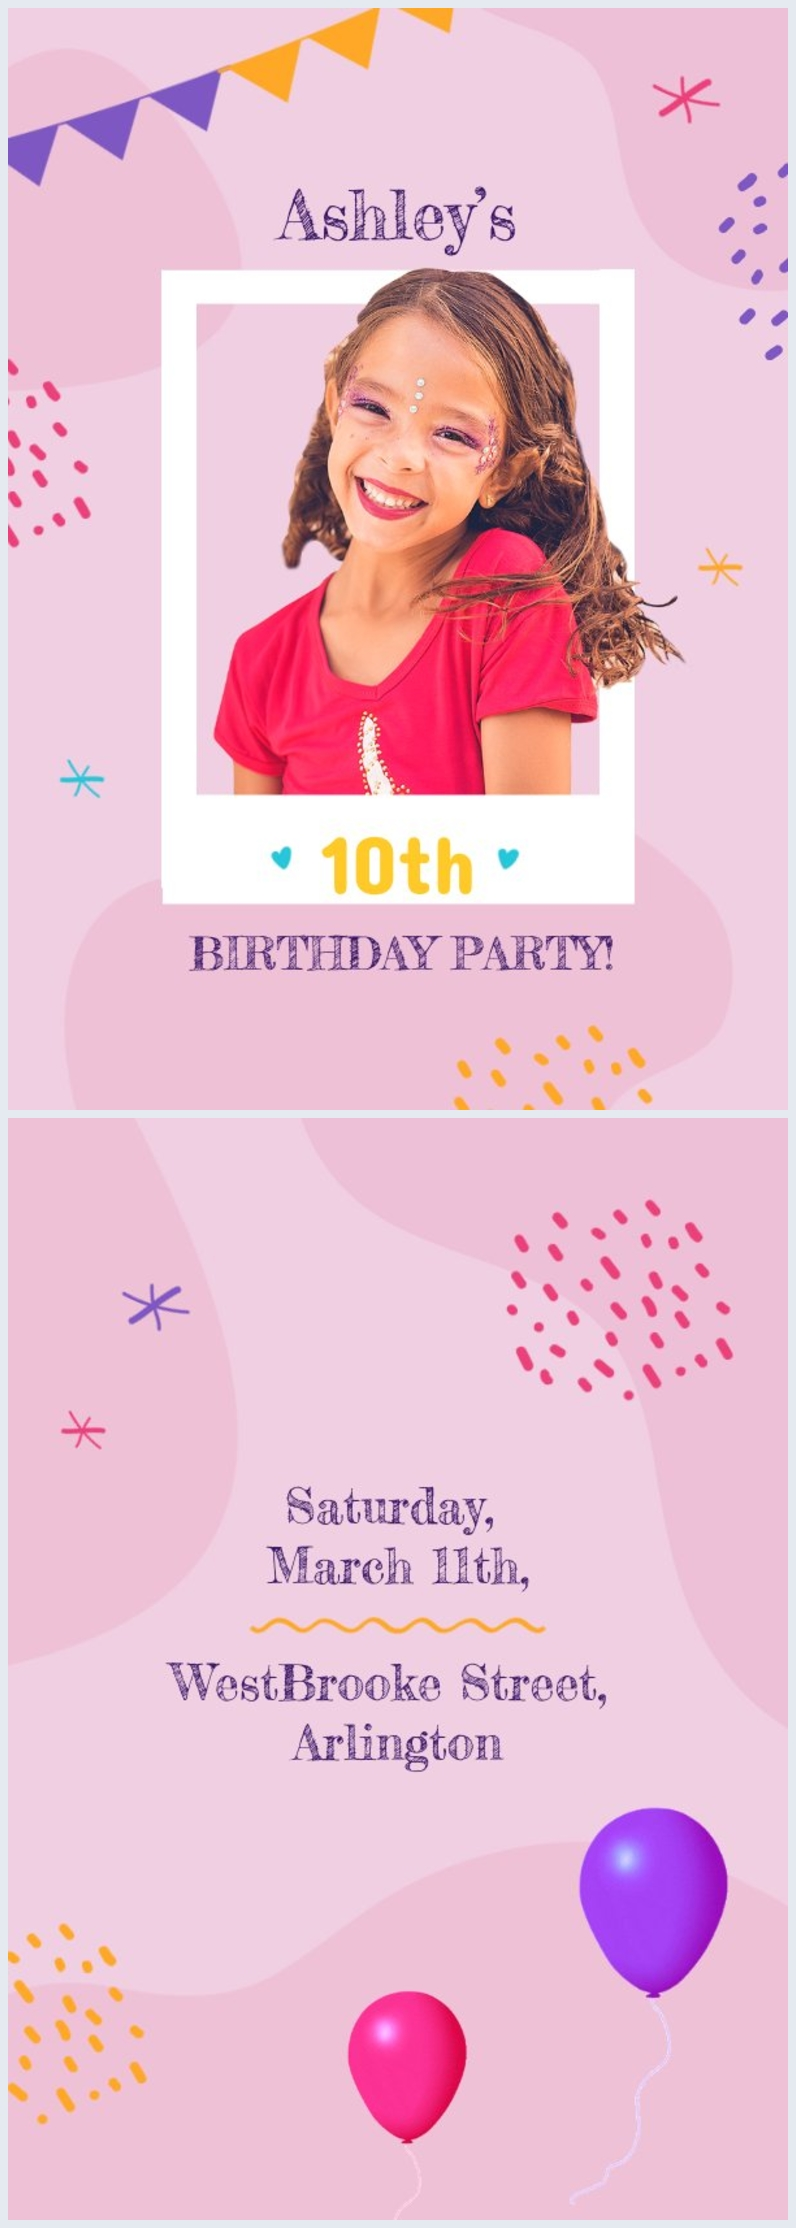 Kinder Verjaardag Uitnodiging Design